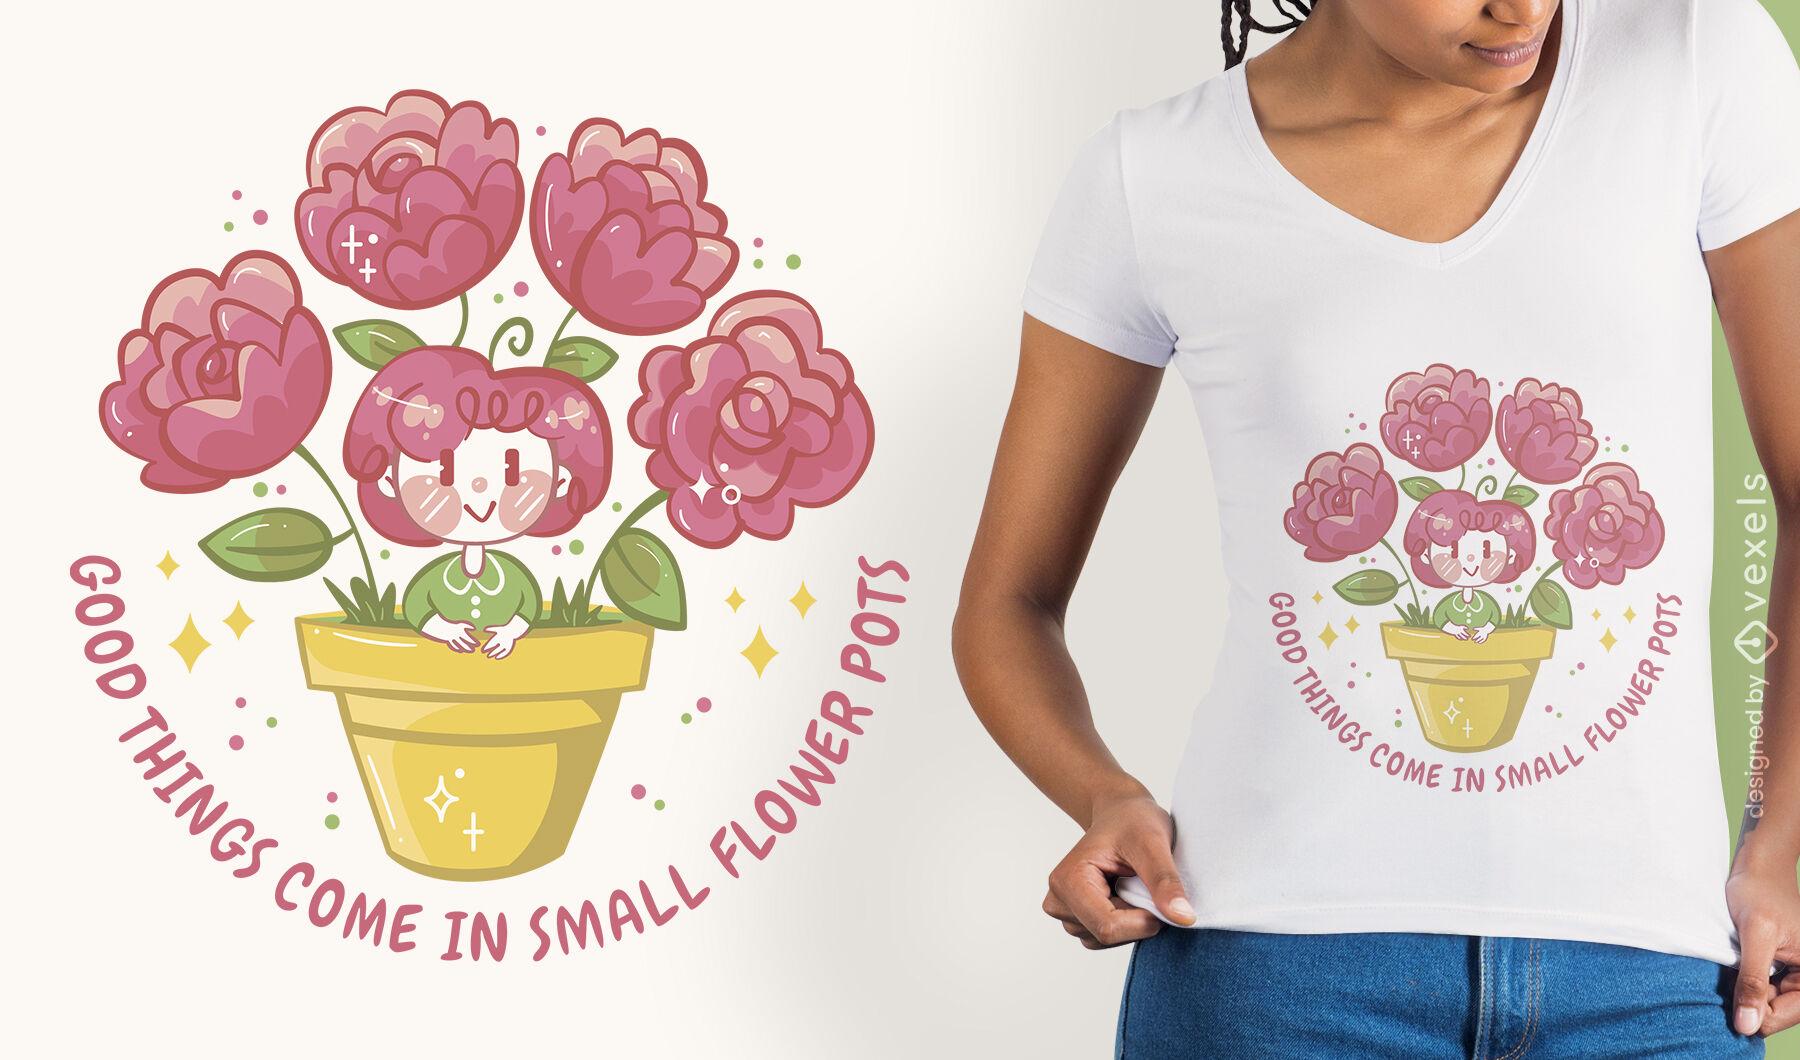 Design de camiseta feminina em vaso de flores